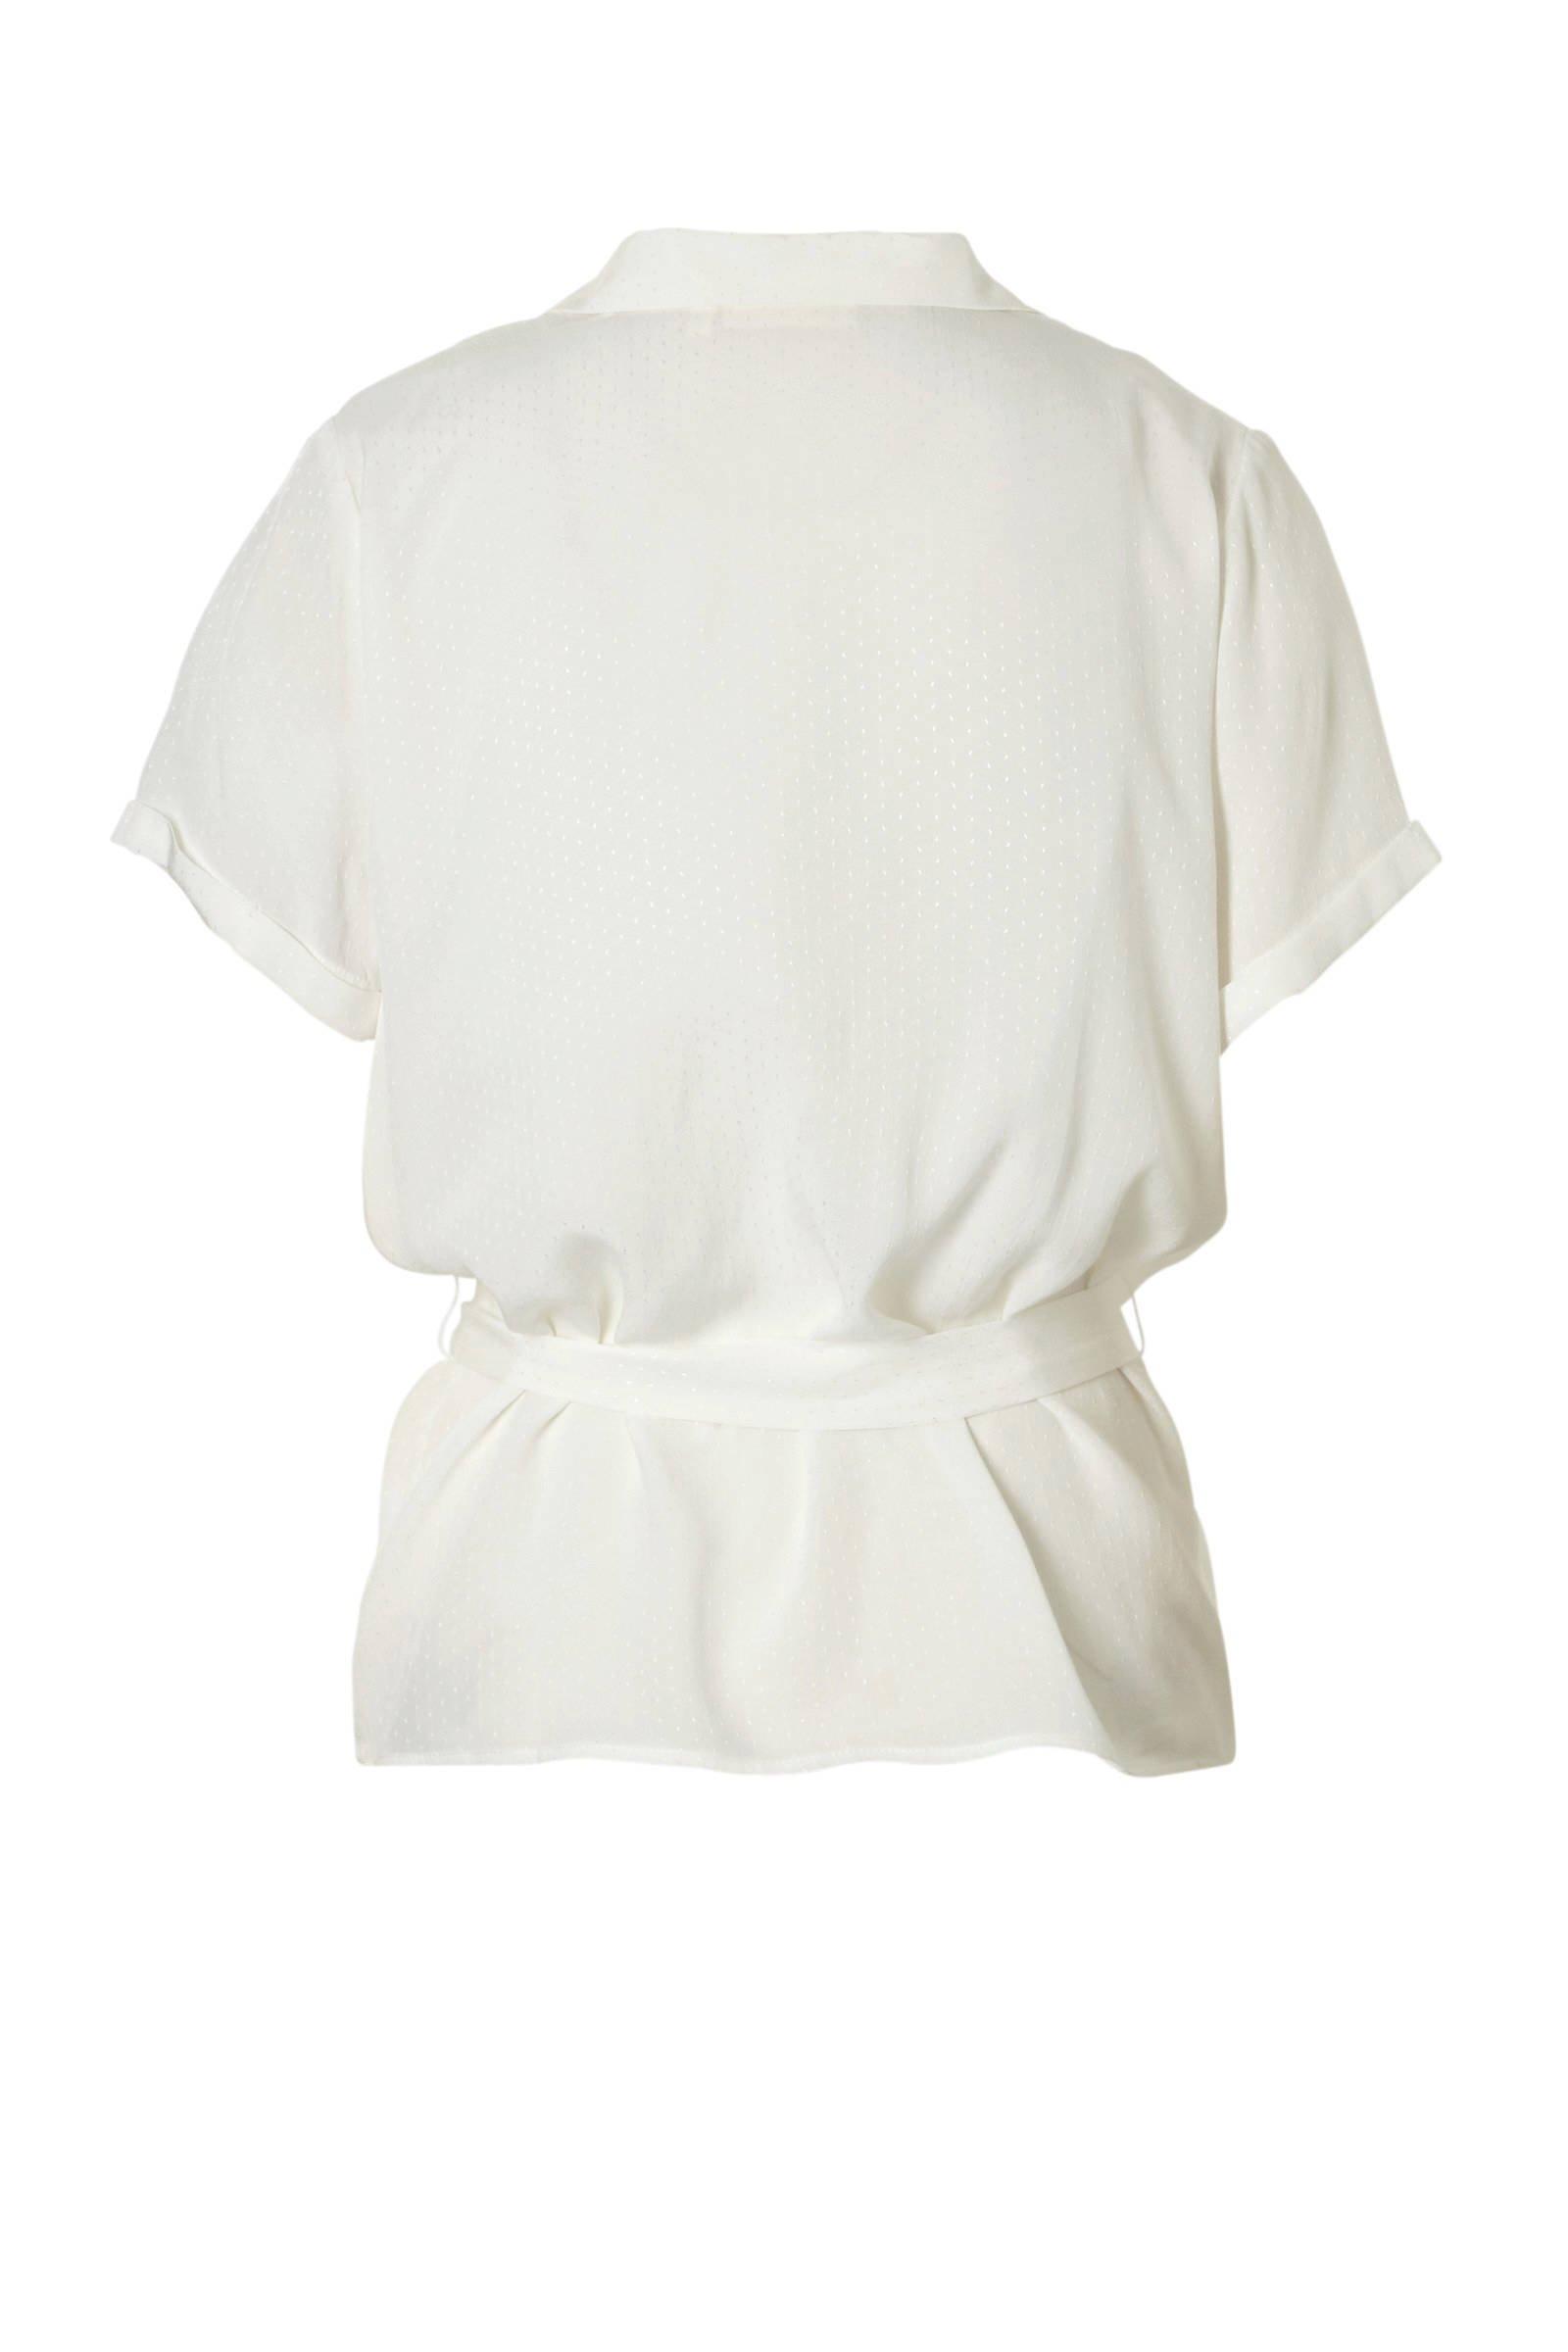 Inwear wit Inwear wit Inwear blouse blouse blouse OqOgpZnx